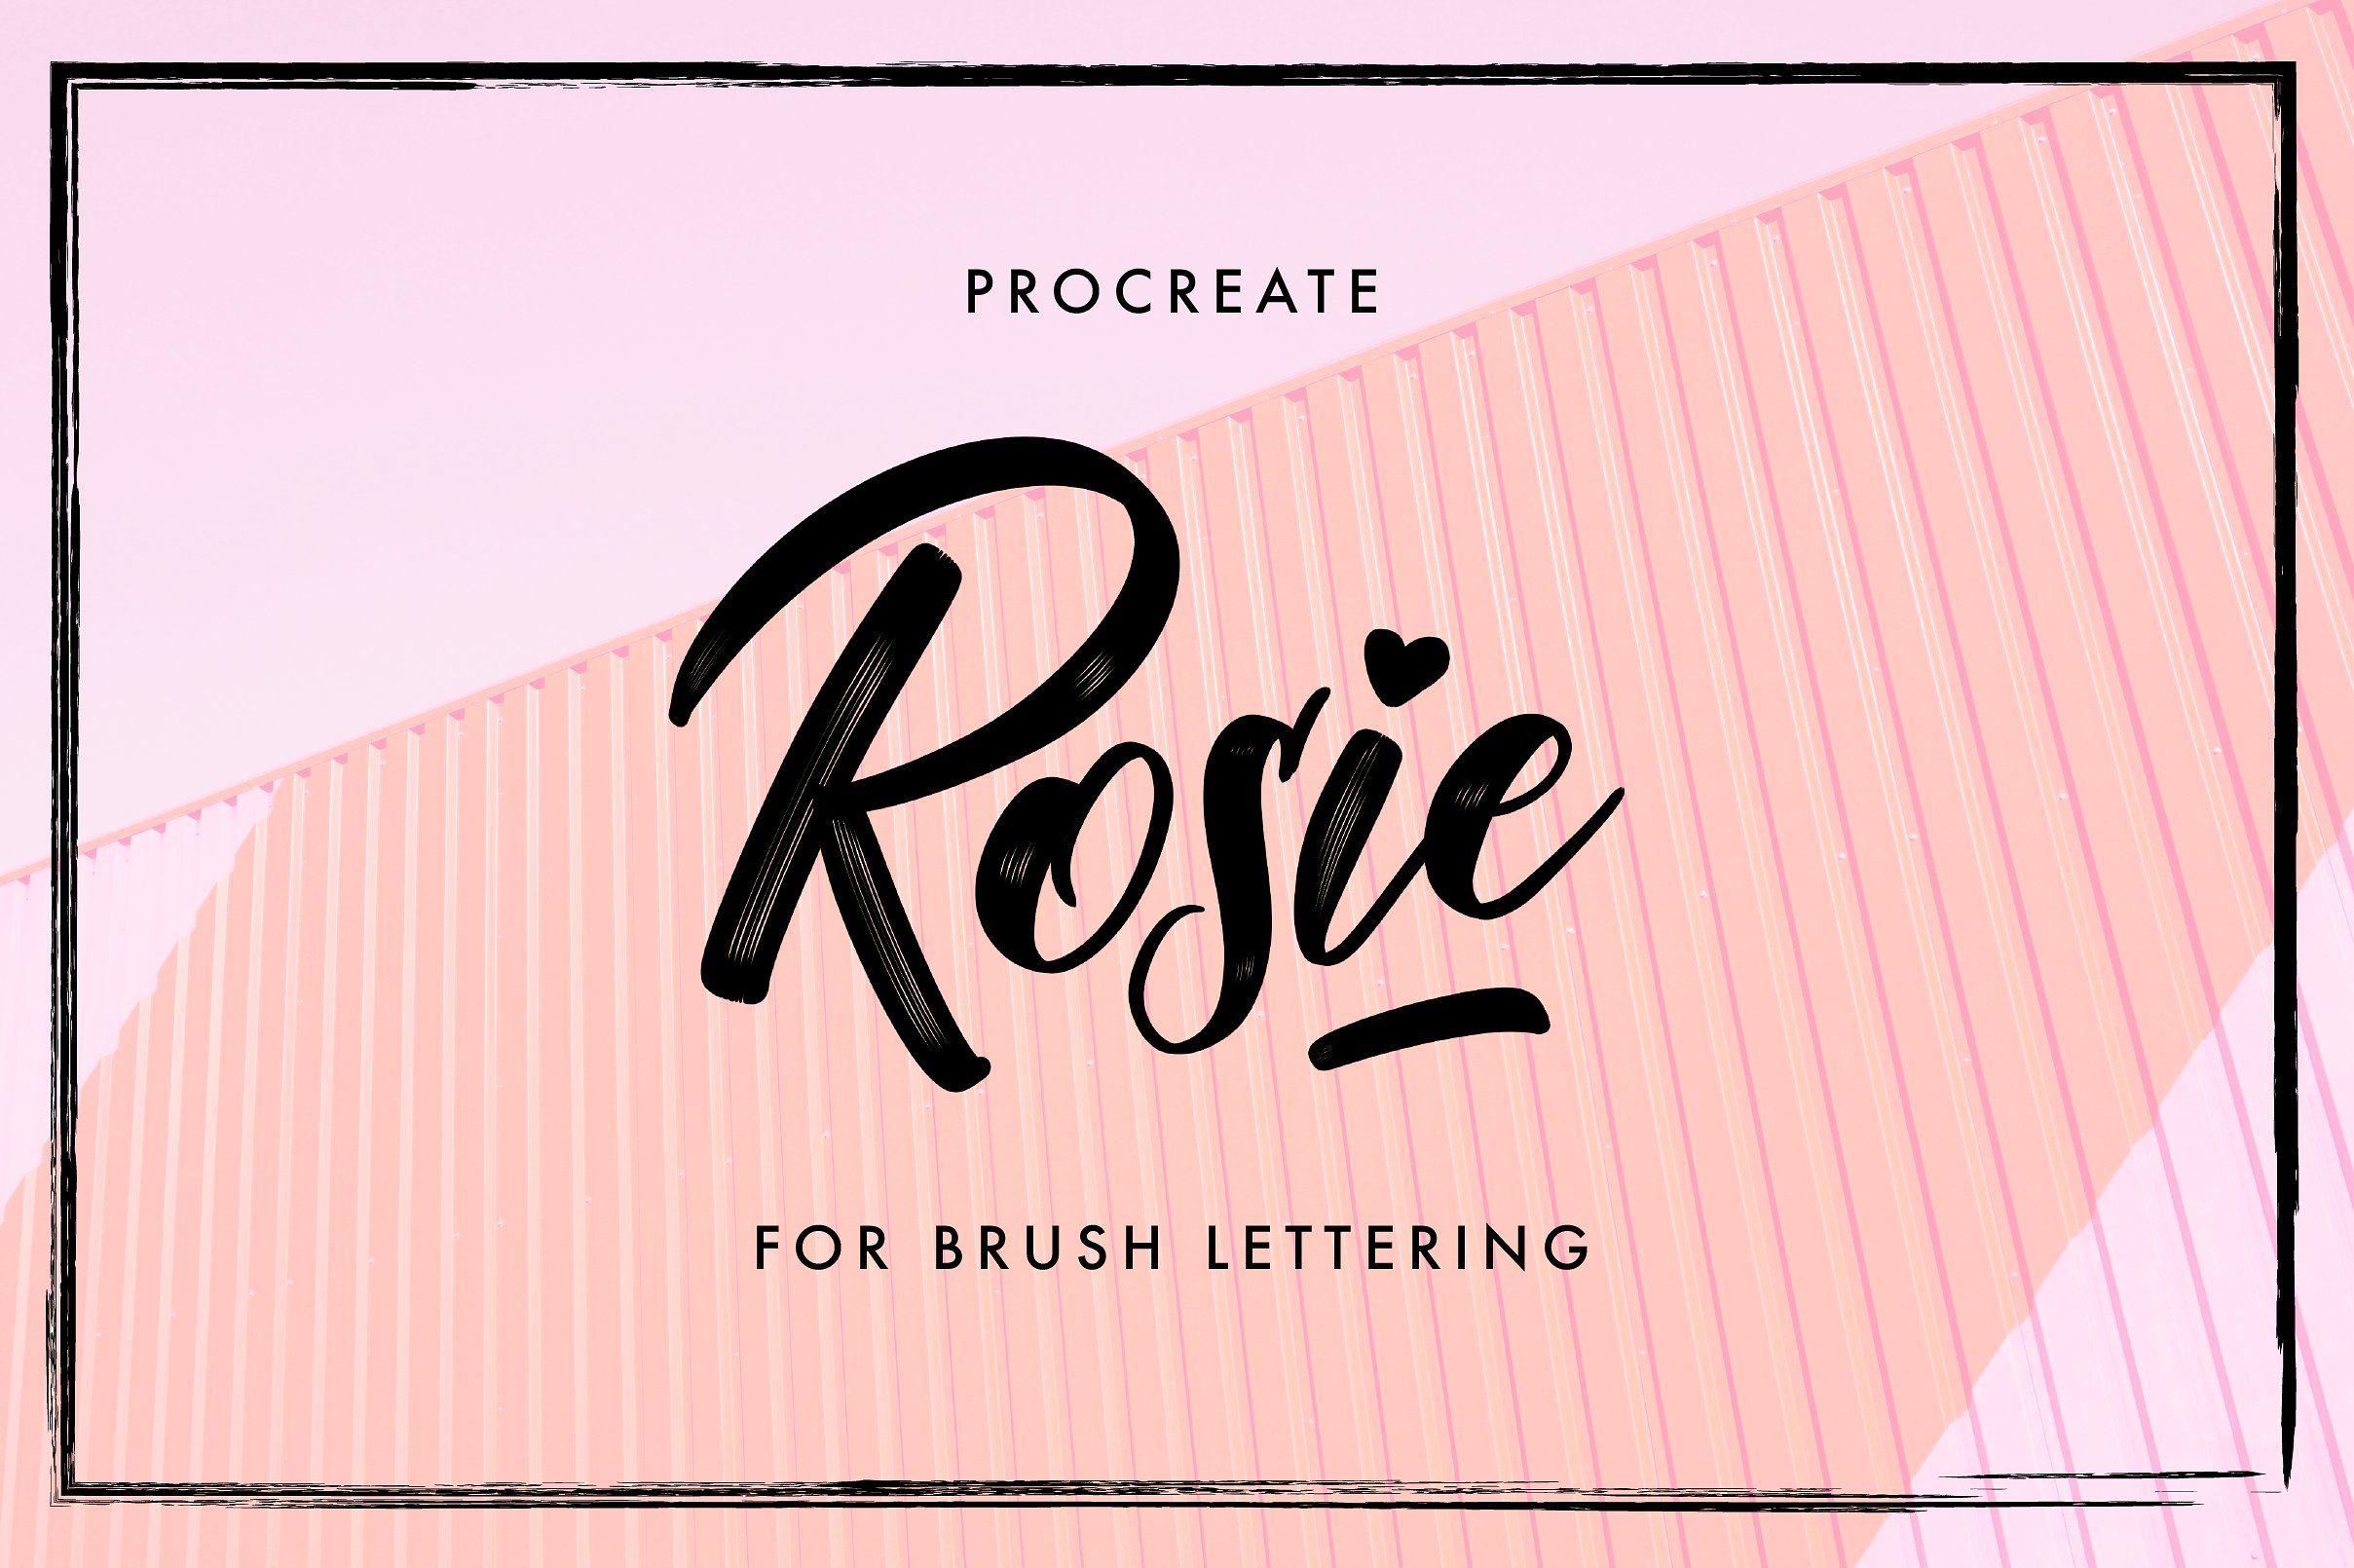 Download Rosie - Procreate Lettering Brush | Lettering, Procreate ...